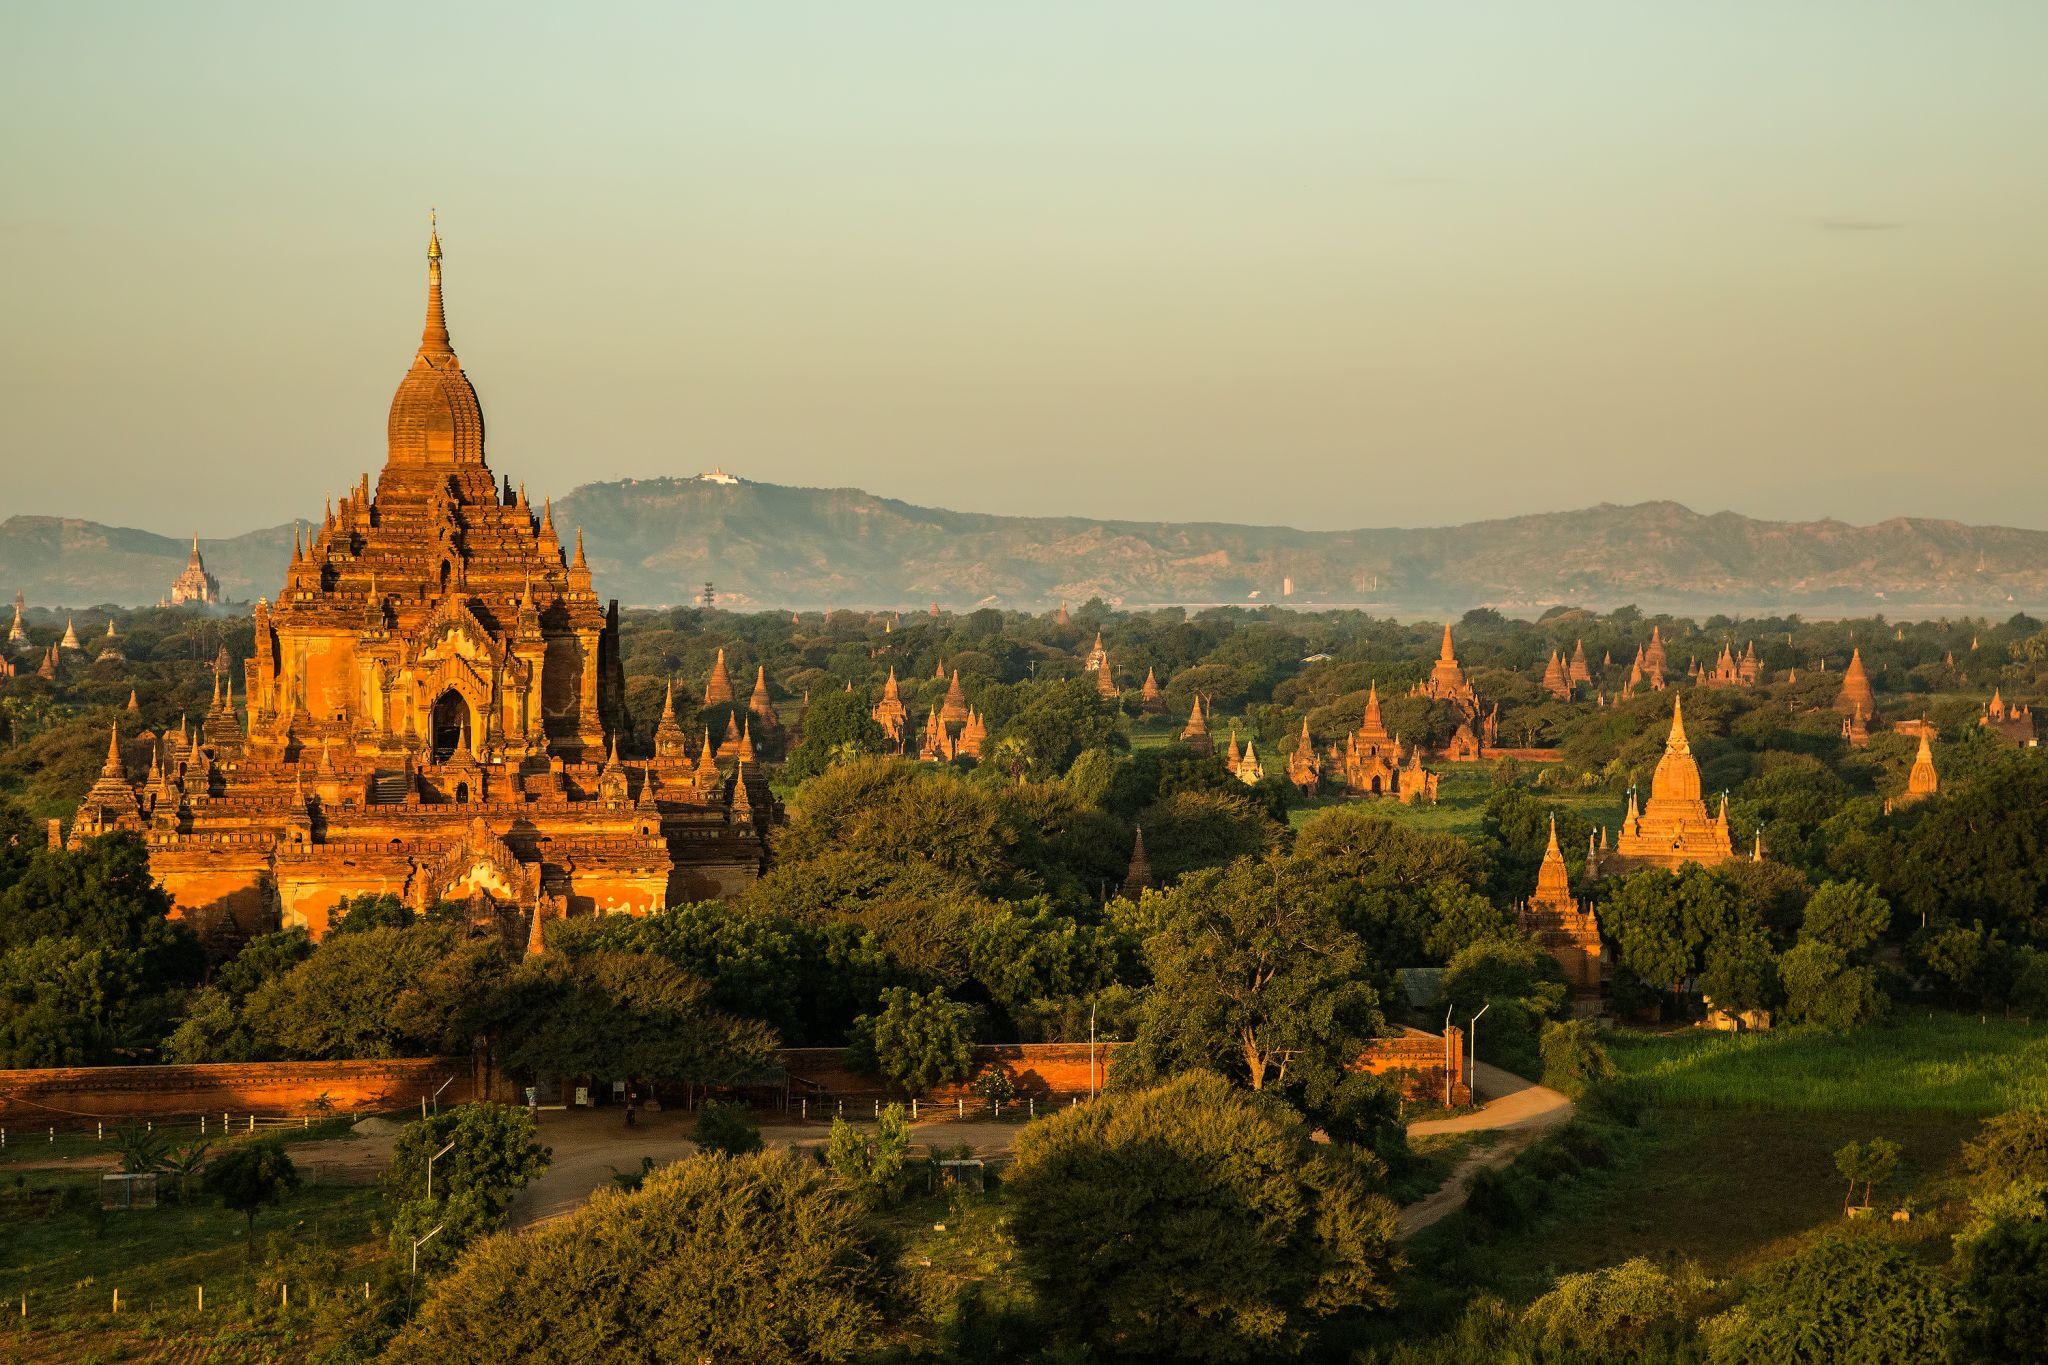 Pagoden in Old Bagan, Myanmar